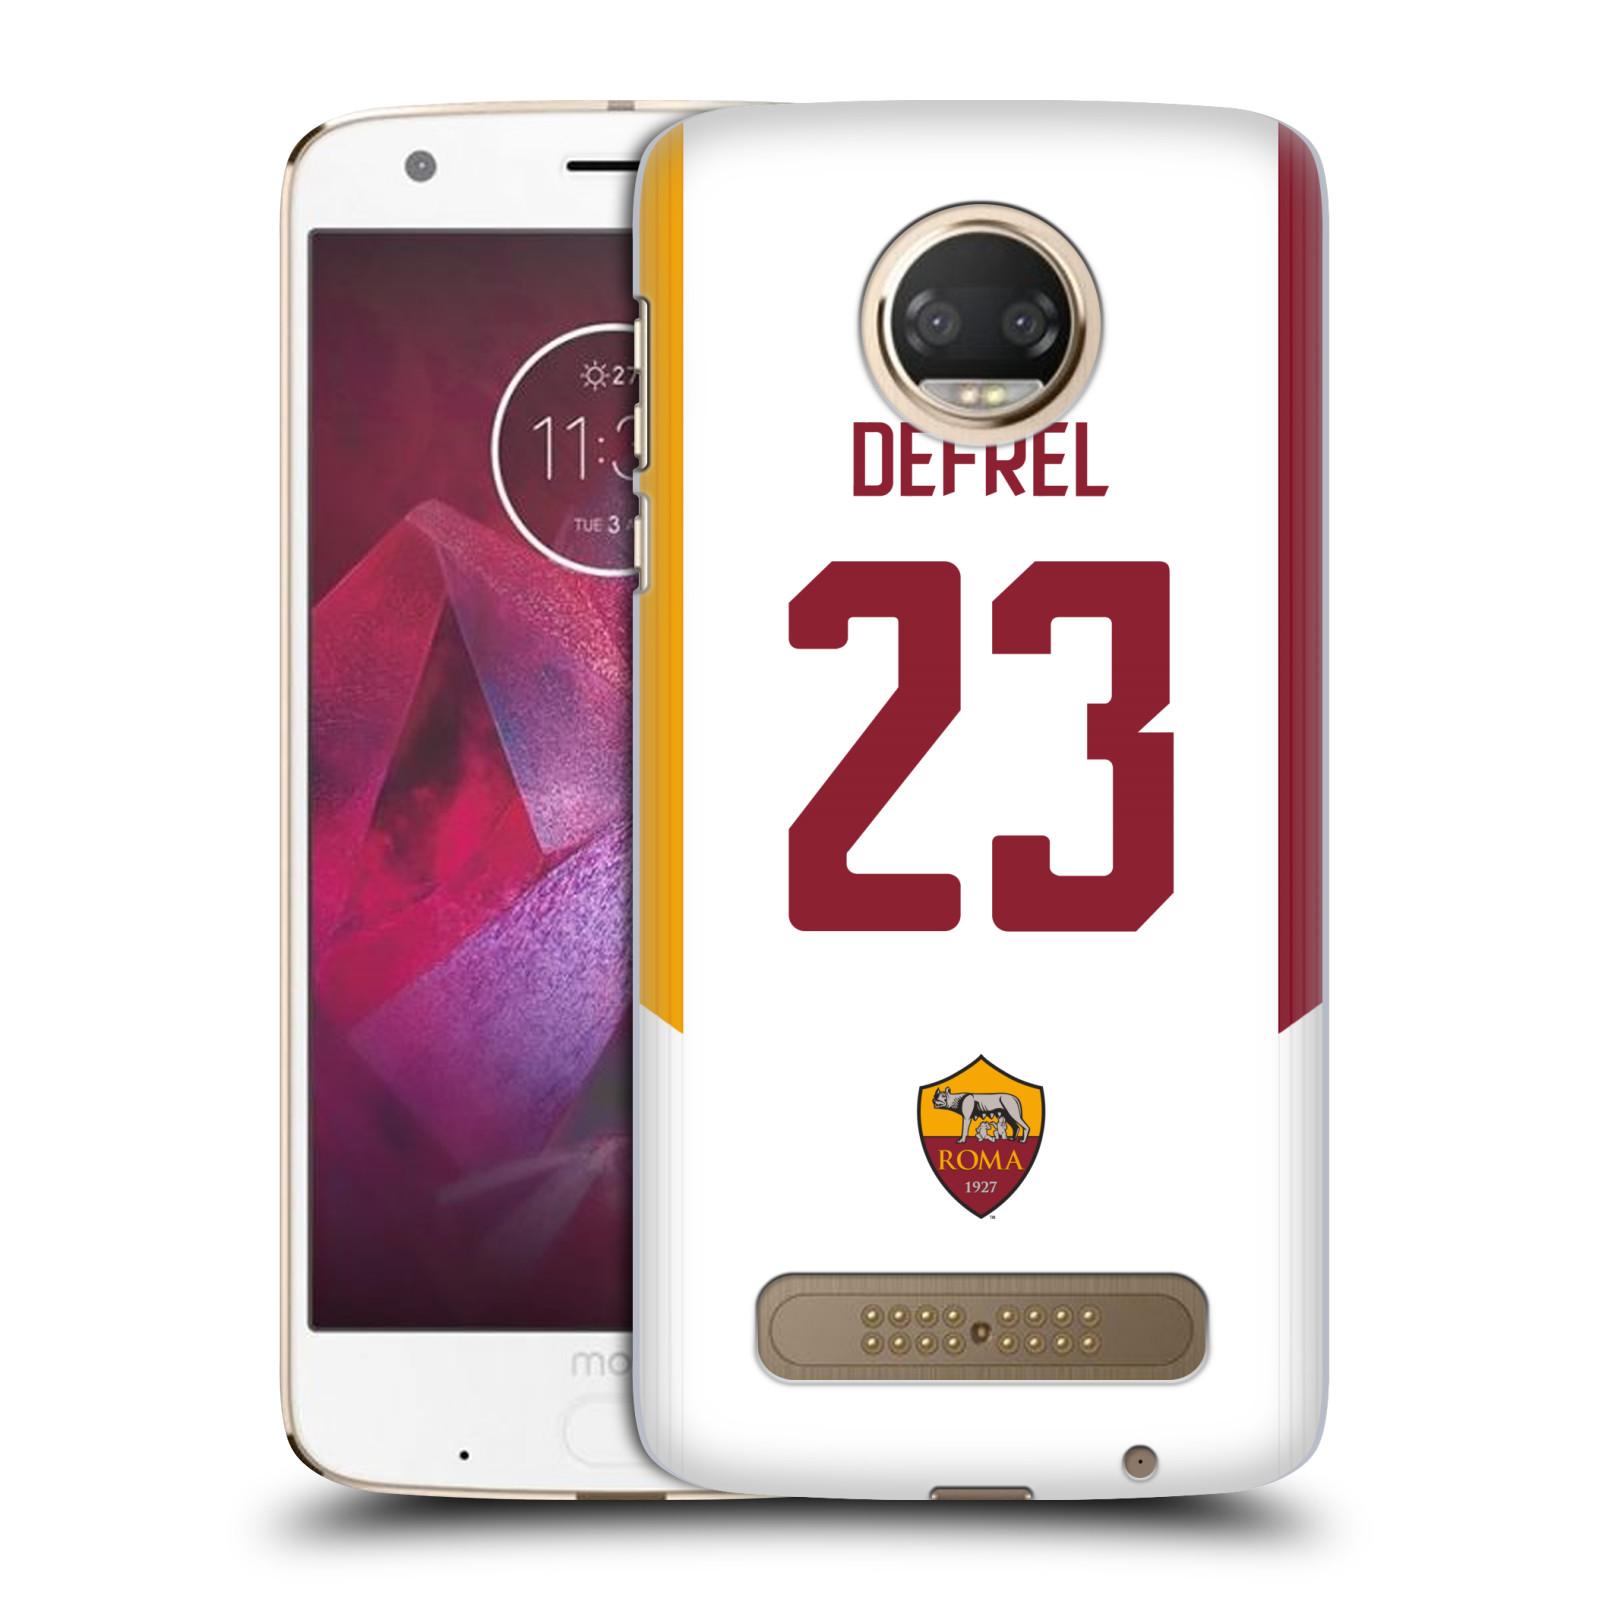 Oficial-como-Roma-2017-18-jugadores-lejos-Kit-grupo-2-caso-para-telefonos-Motorola-1